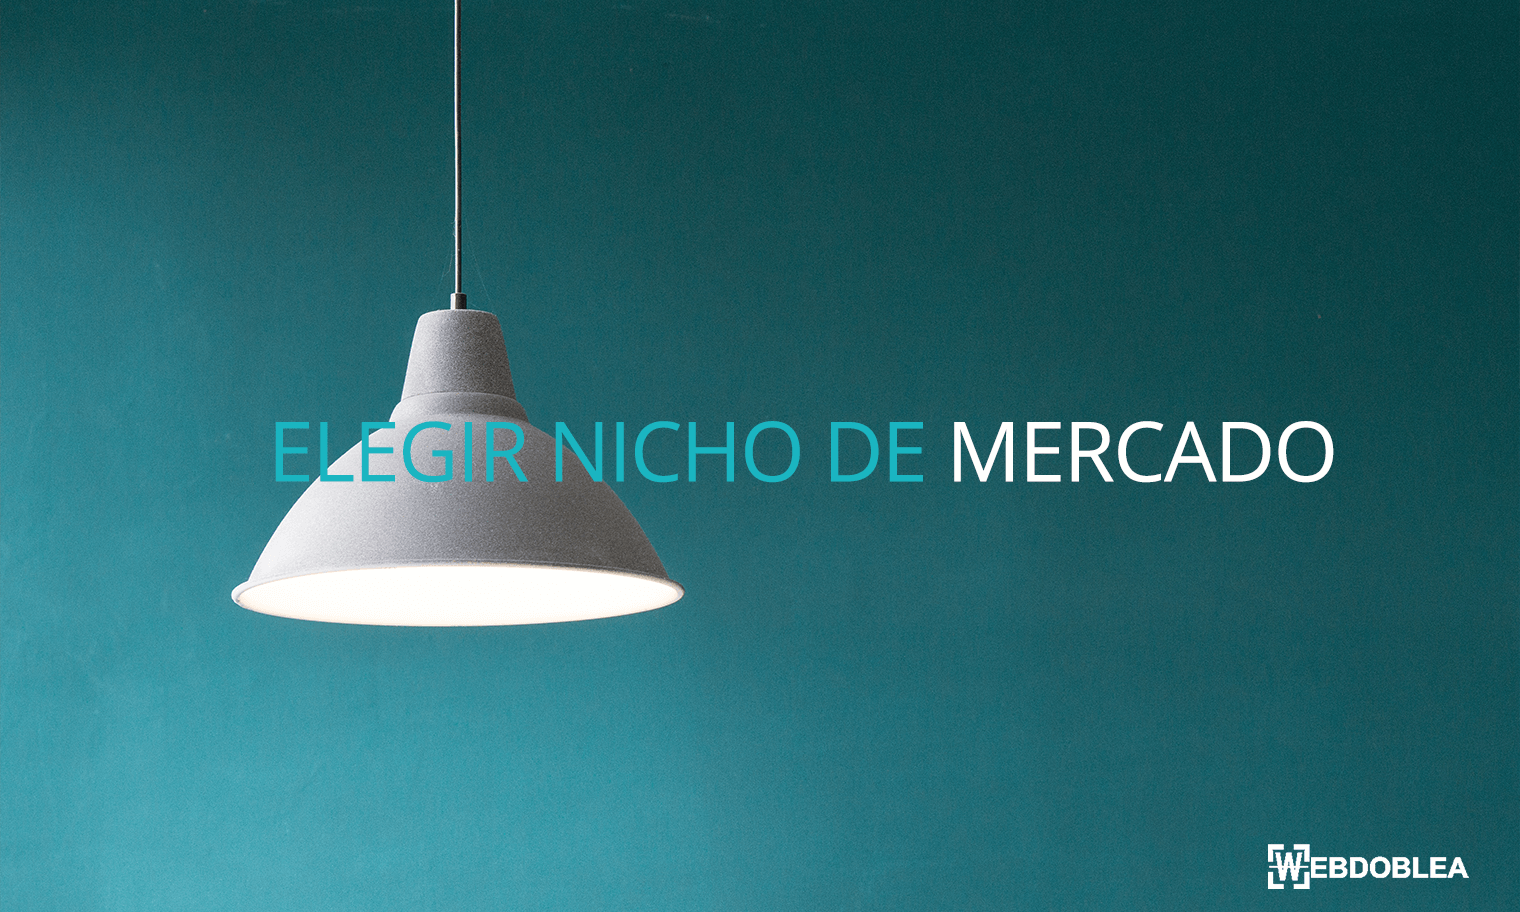 elegir_nicho_mercado